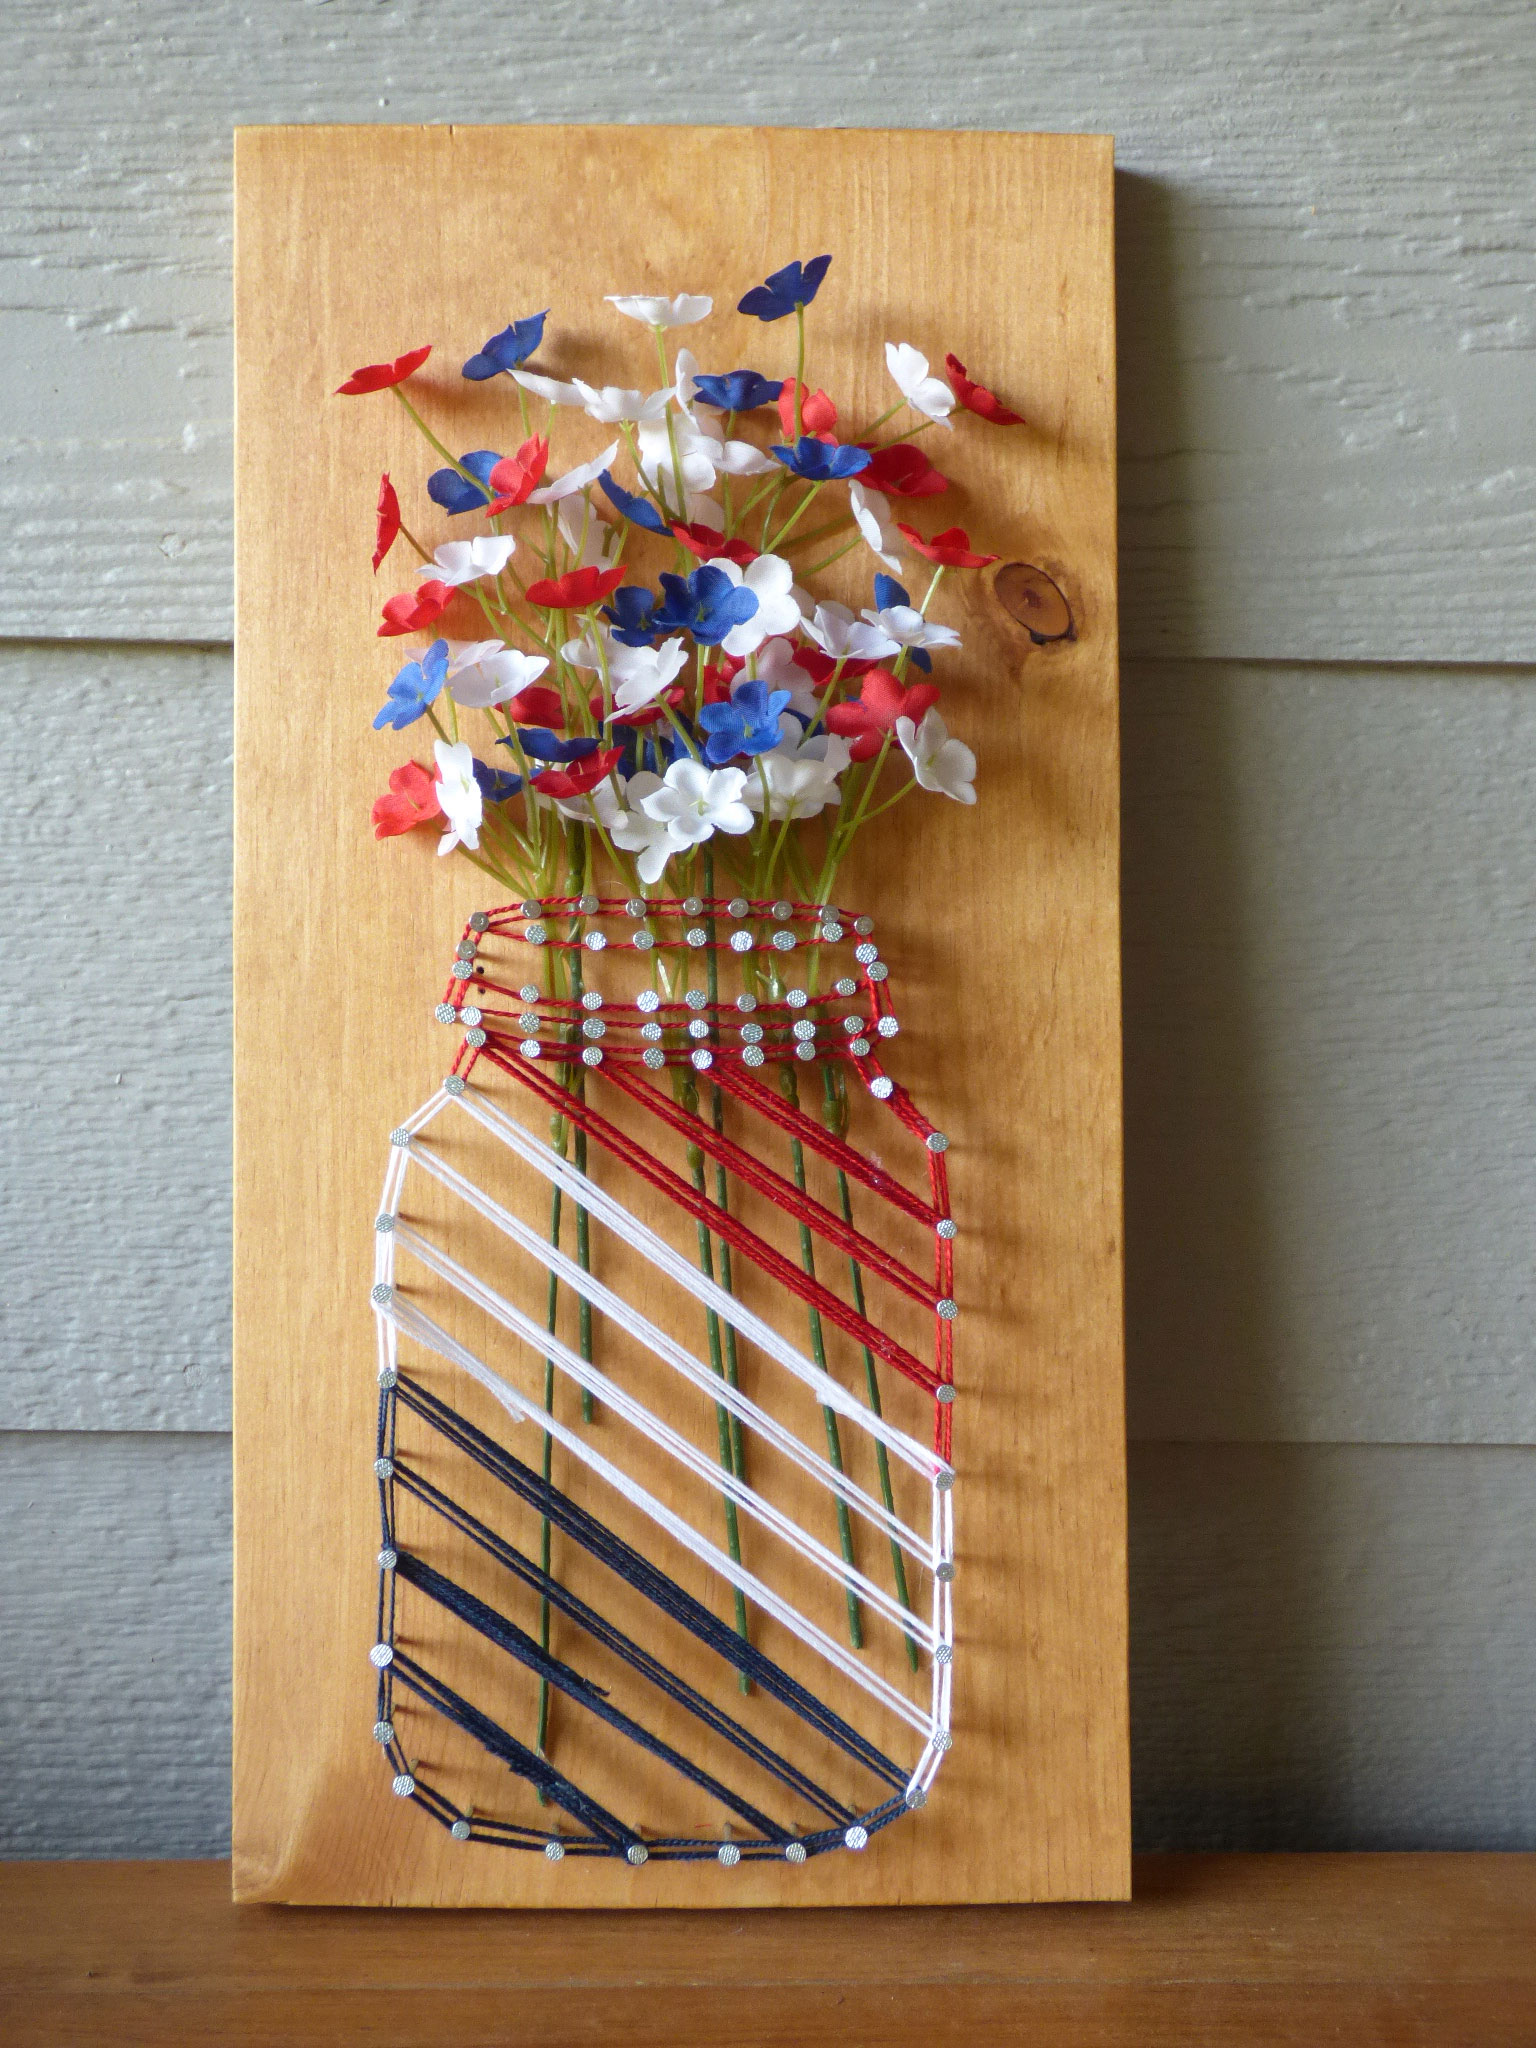 How to make a Mason Jar String Art Flower Vase